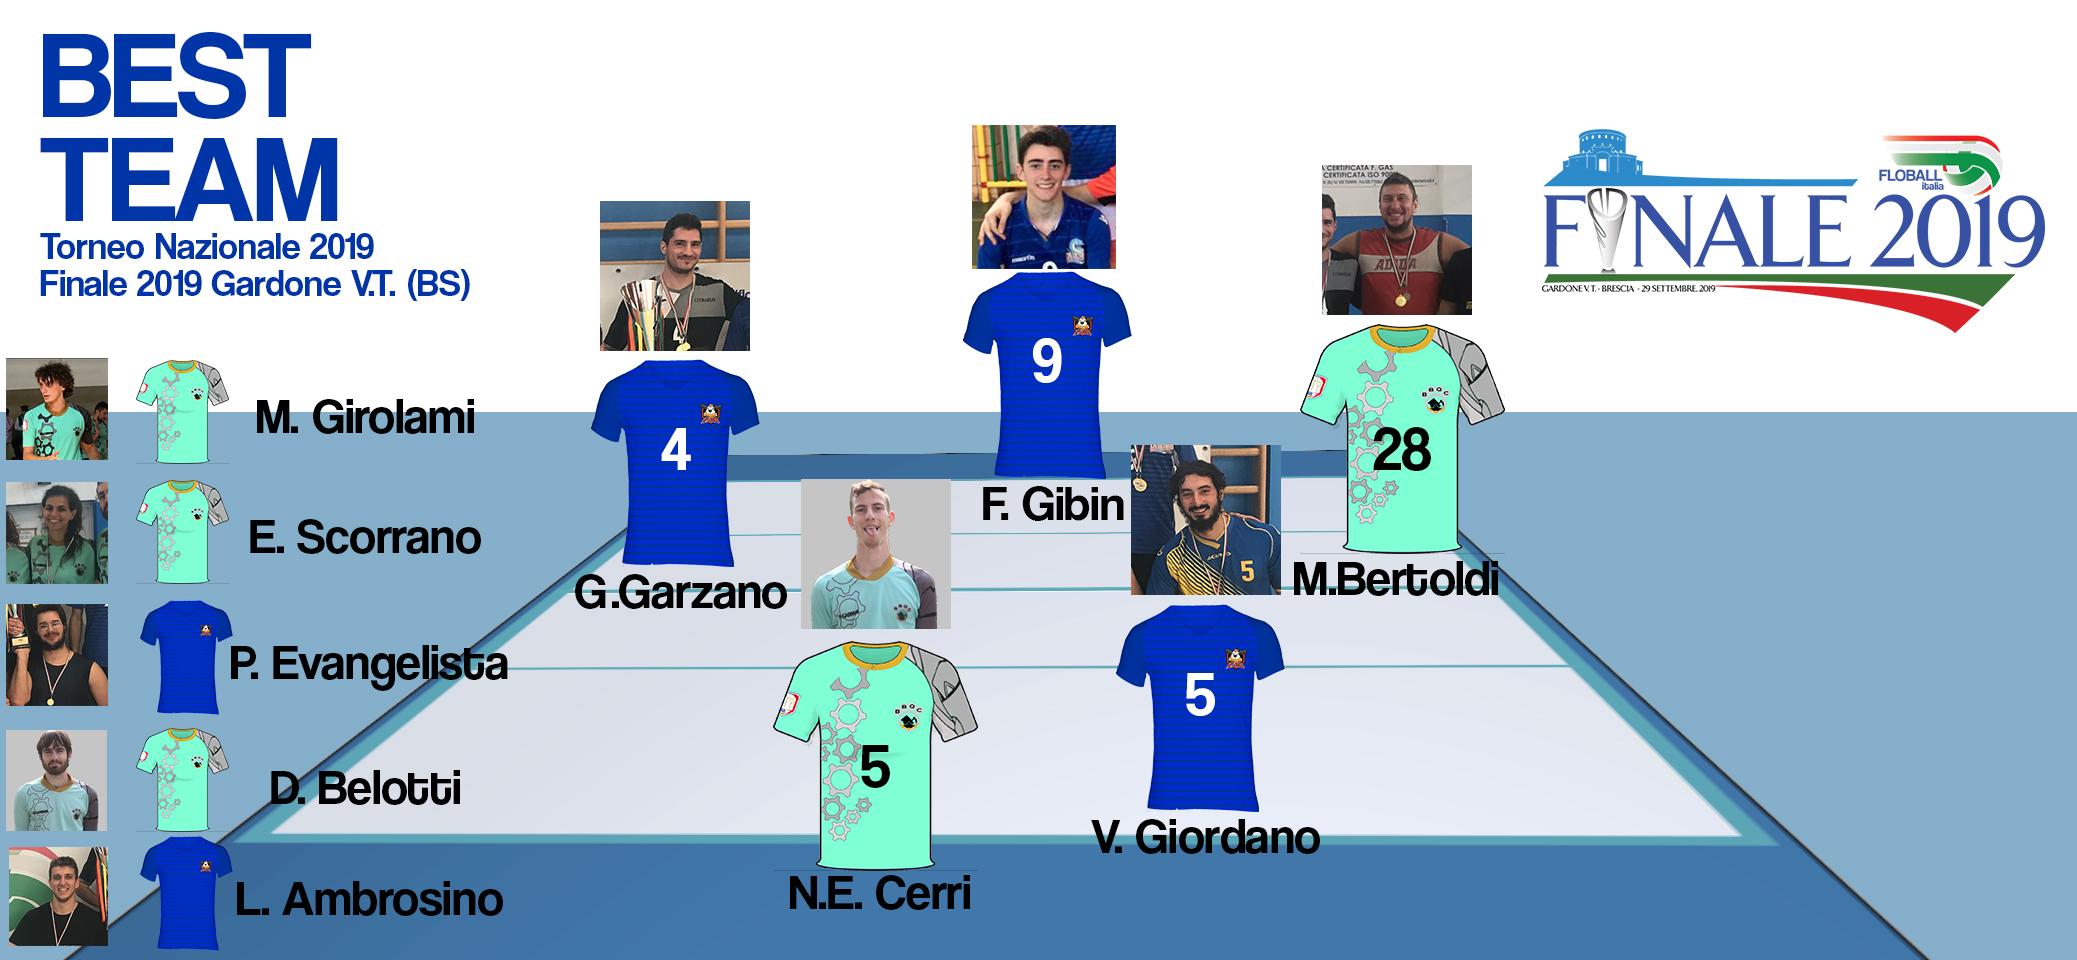 best team Torneo Nazionale Finale 2019